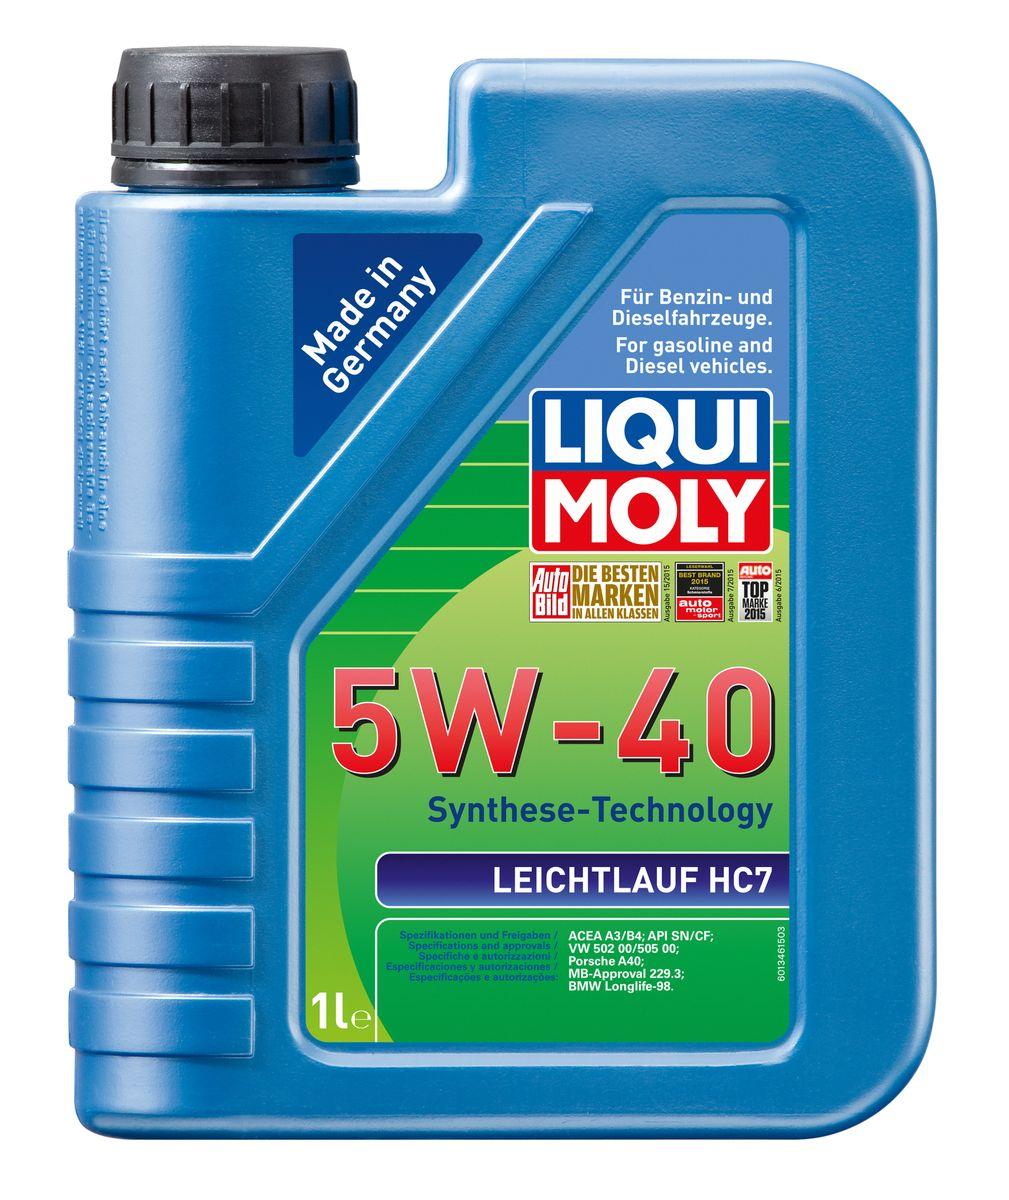 "Масло моторное Liqui Moly ""Leichtlauf HC 7"", НС-синтетическое, 5W-40, 1 л 1346"